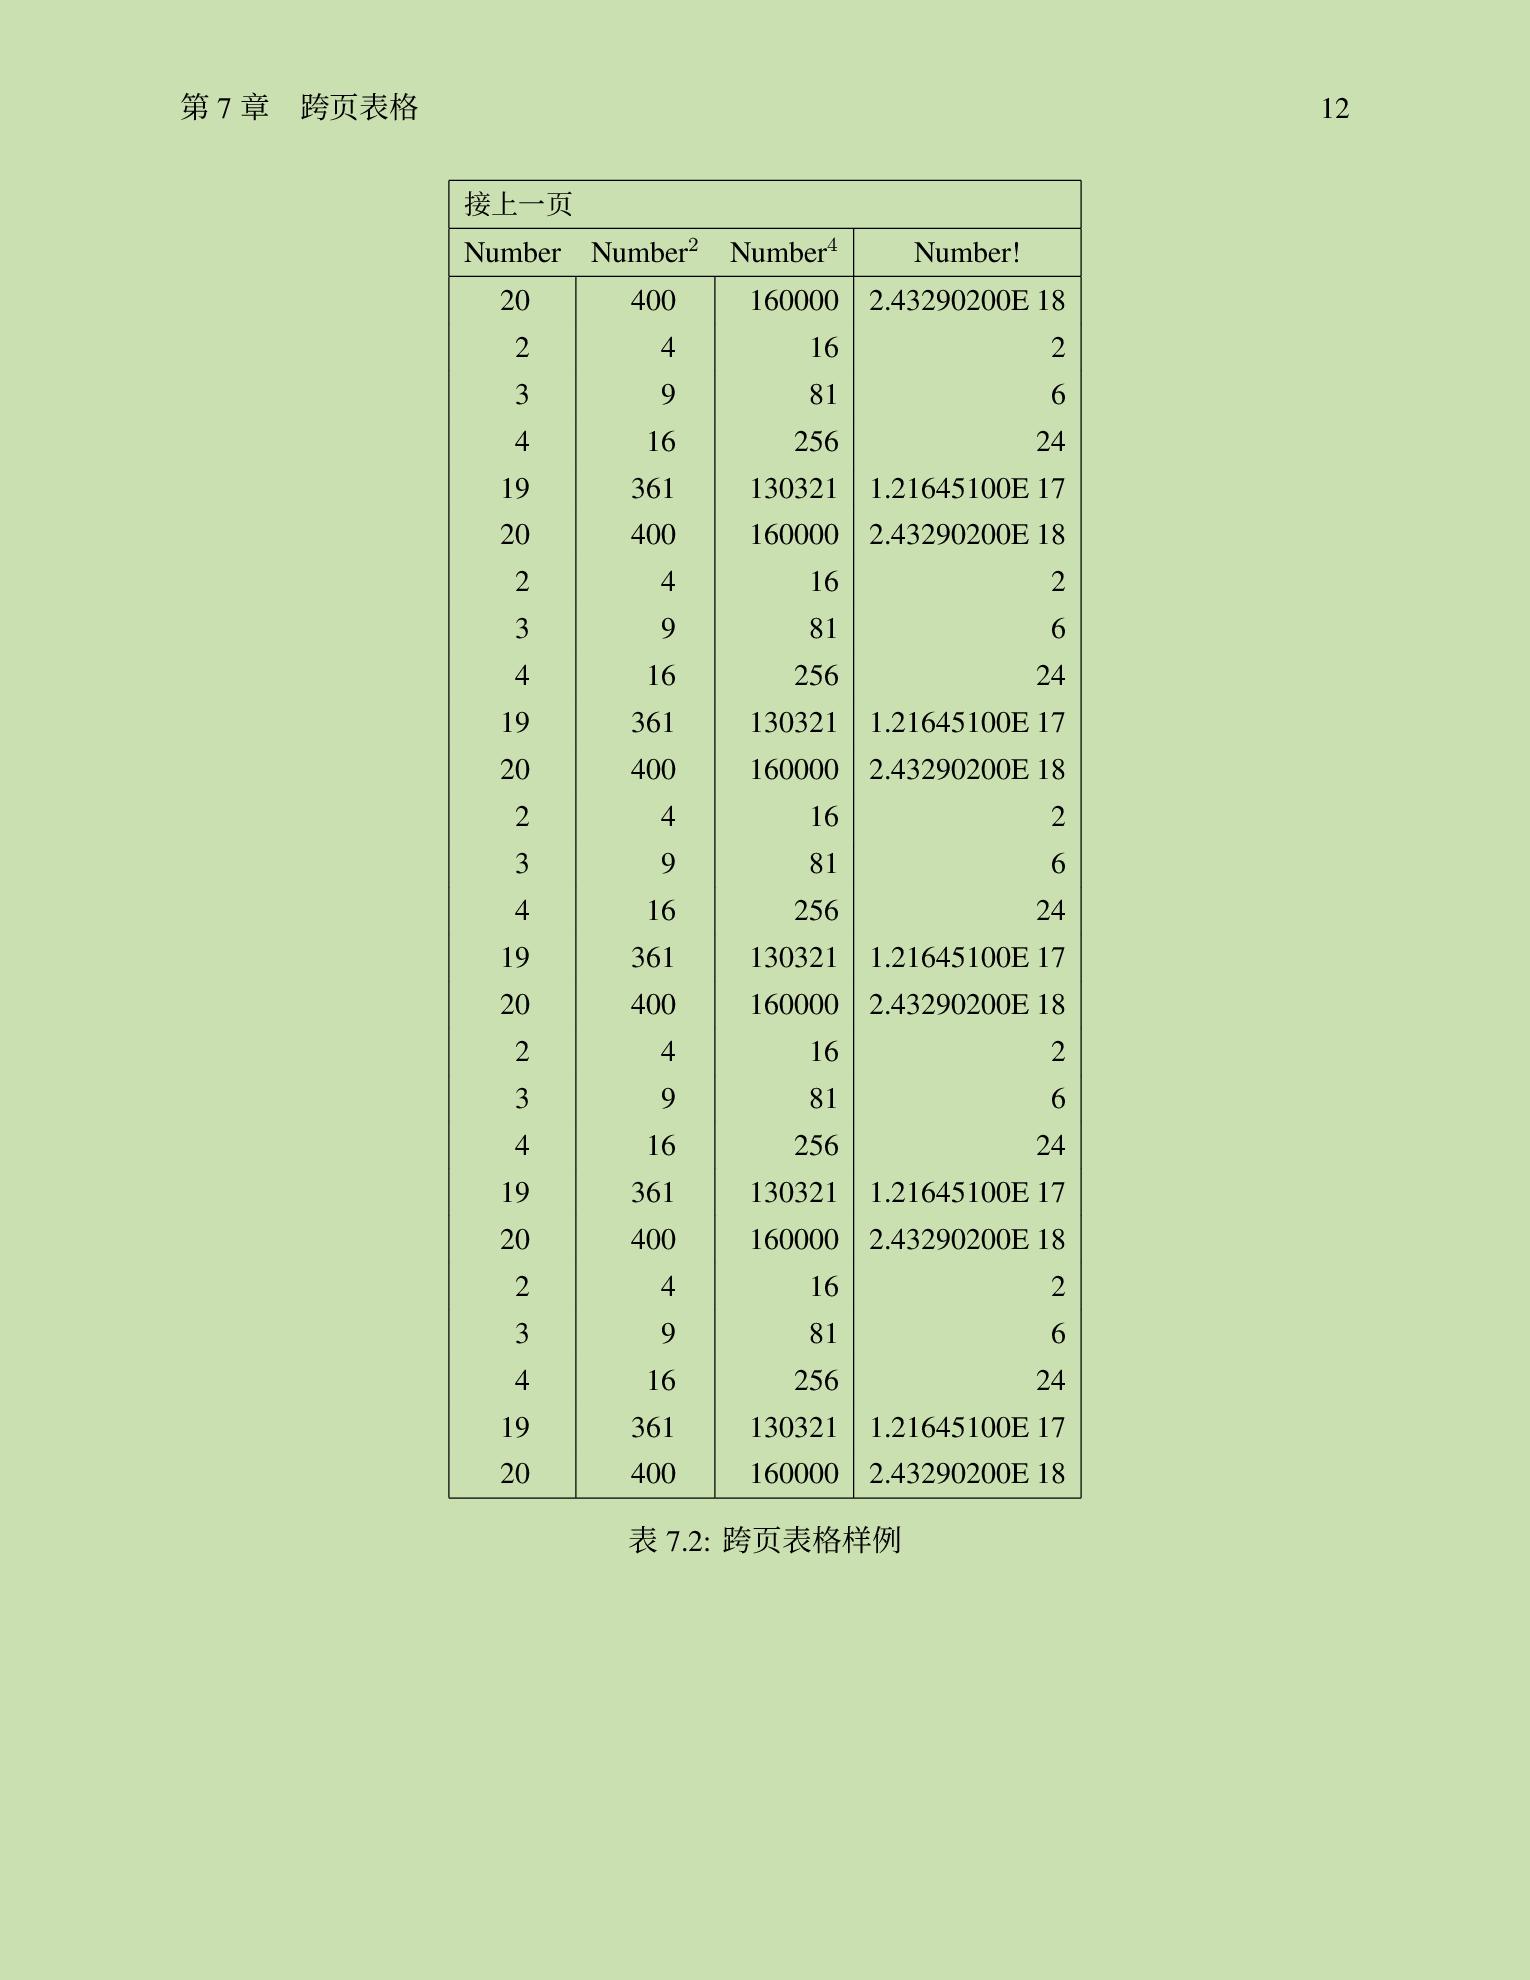 LaTeX 中表格的制作 2.0